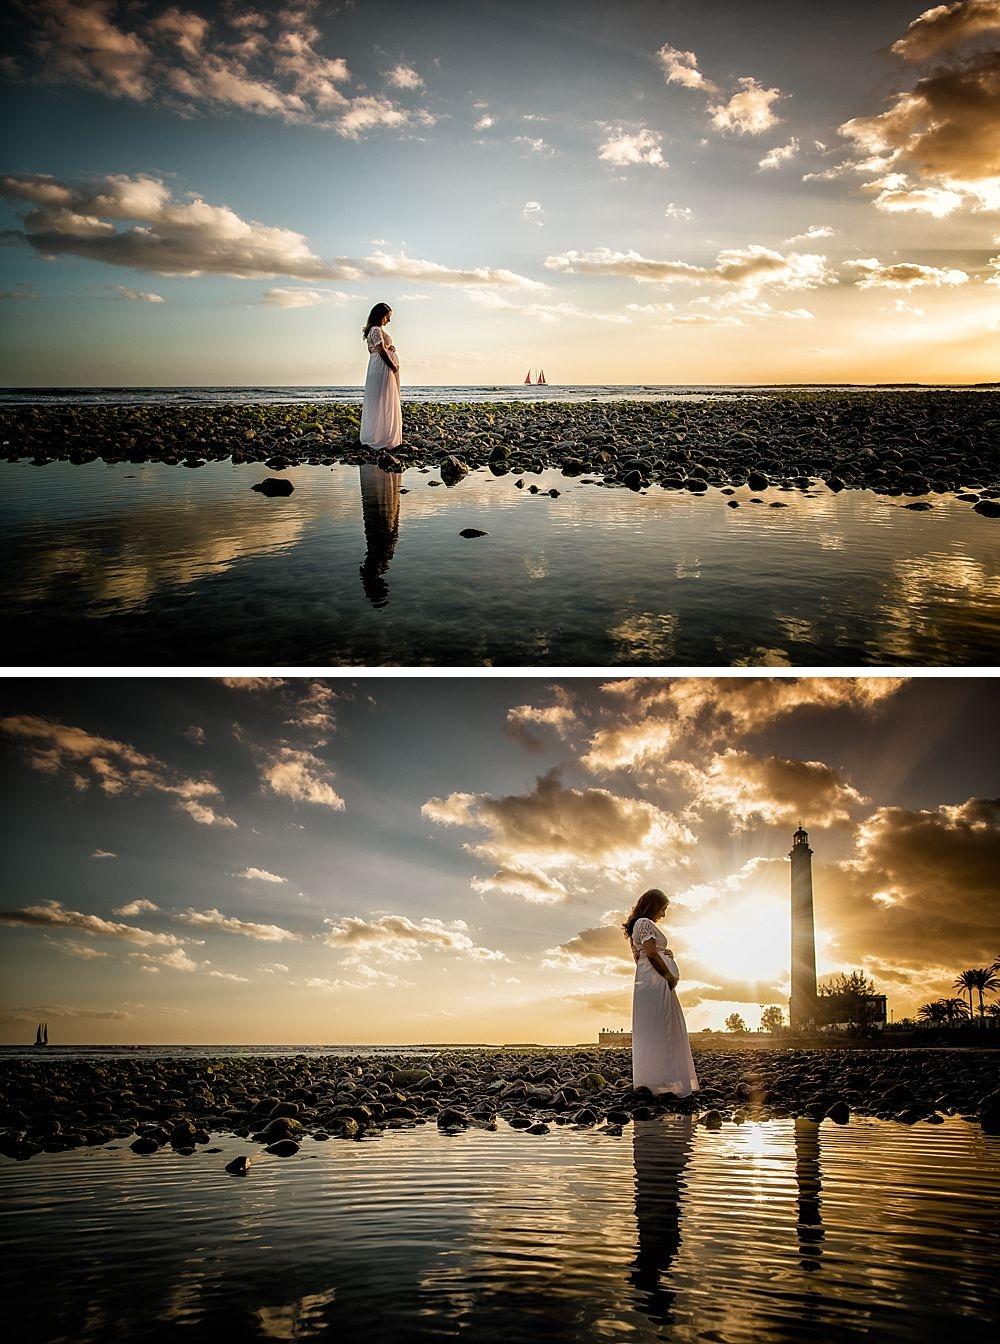 108-mette-brandt-photography-8506_Maspalomas-beach